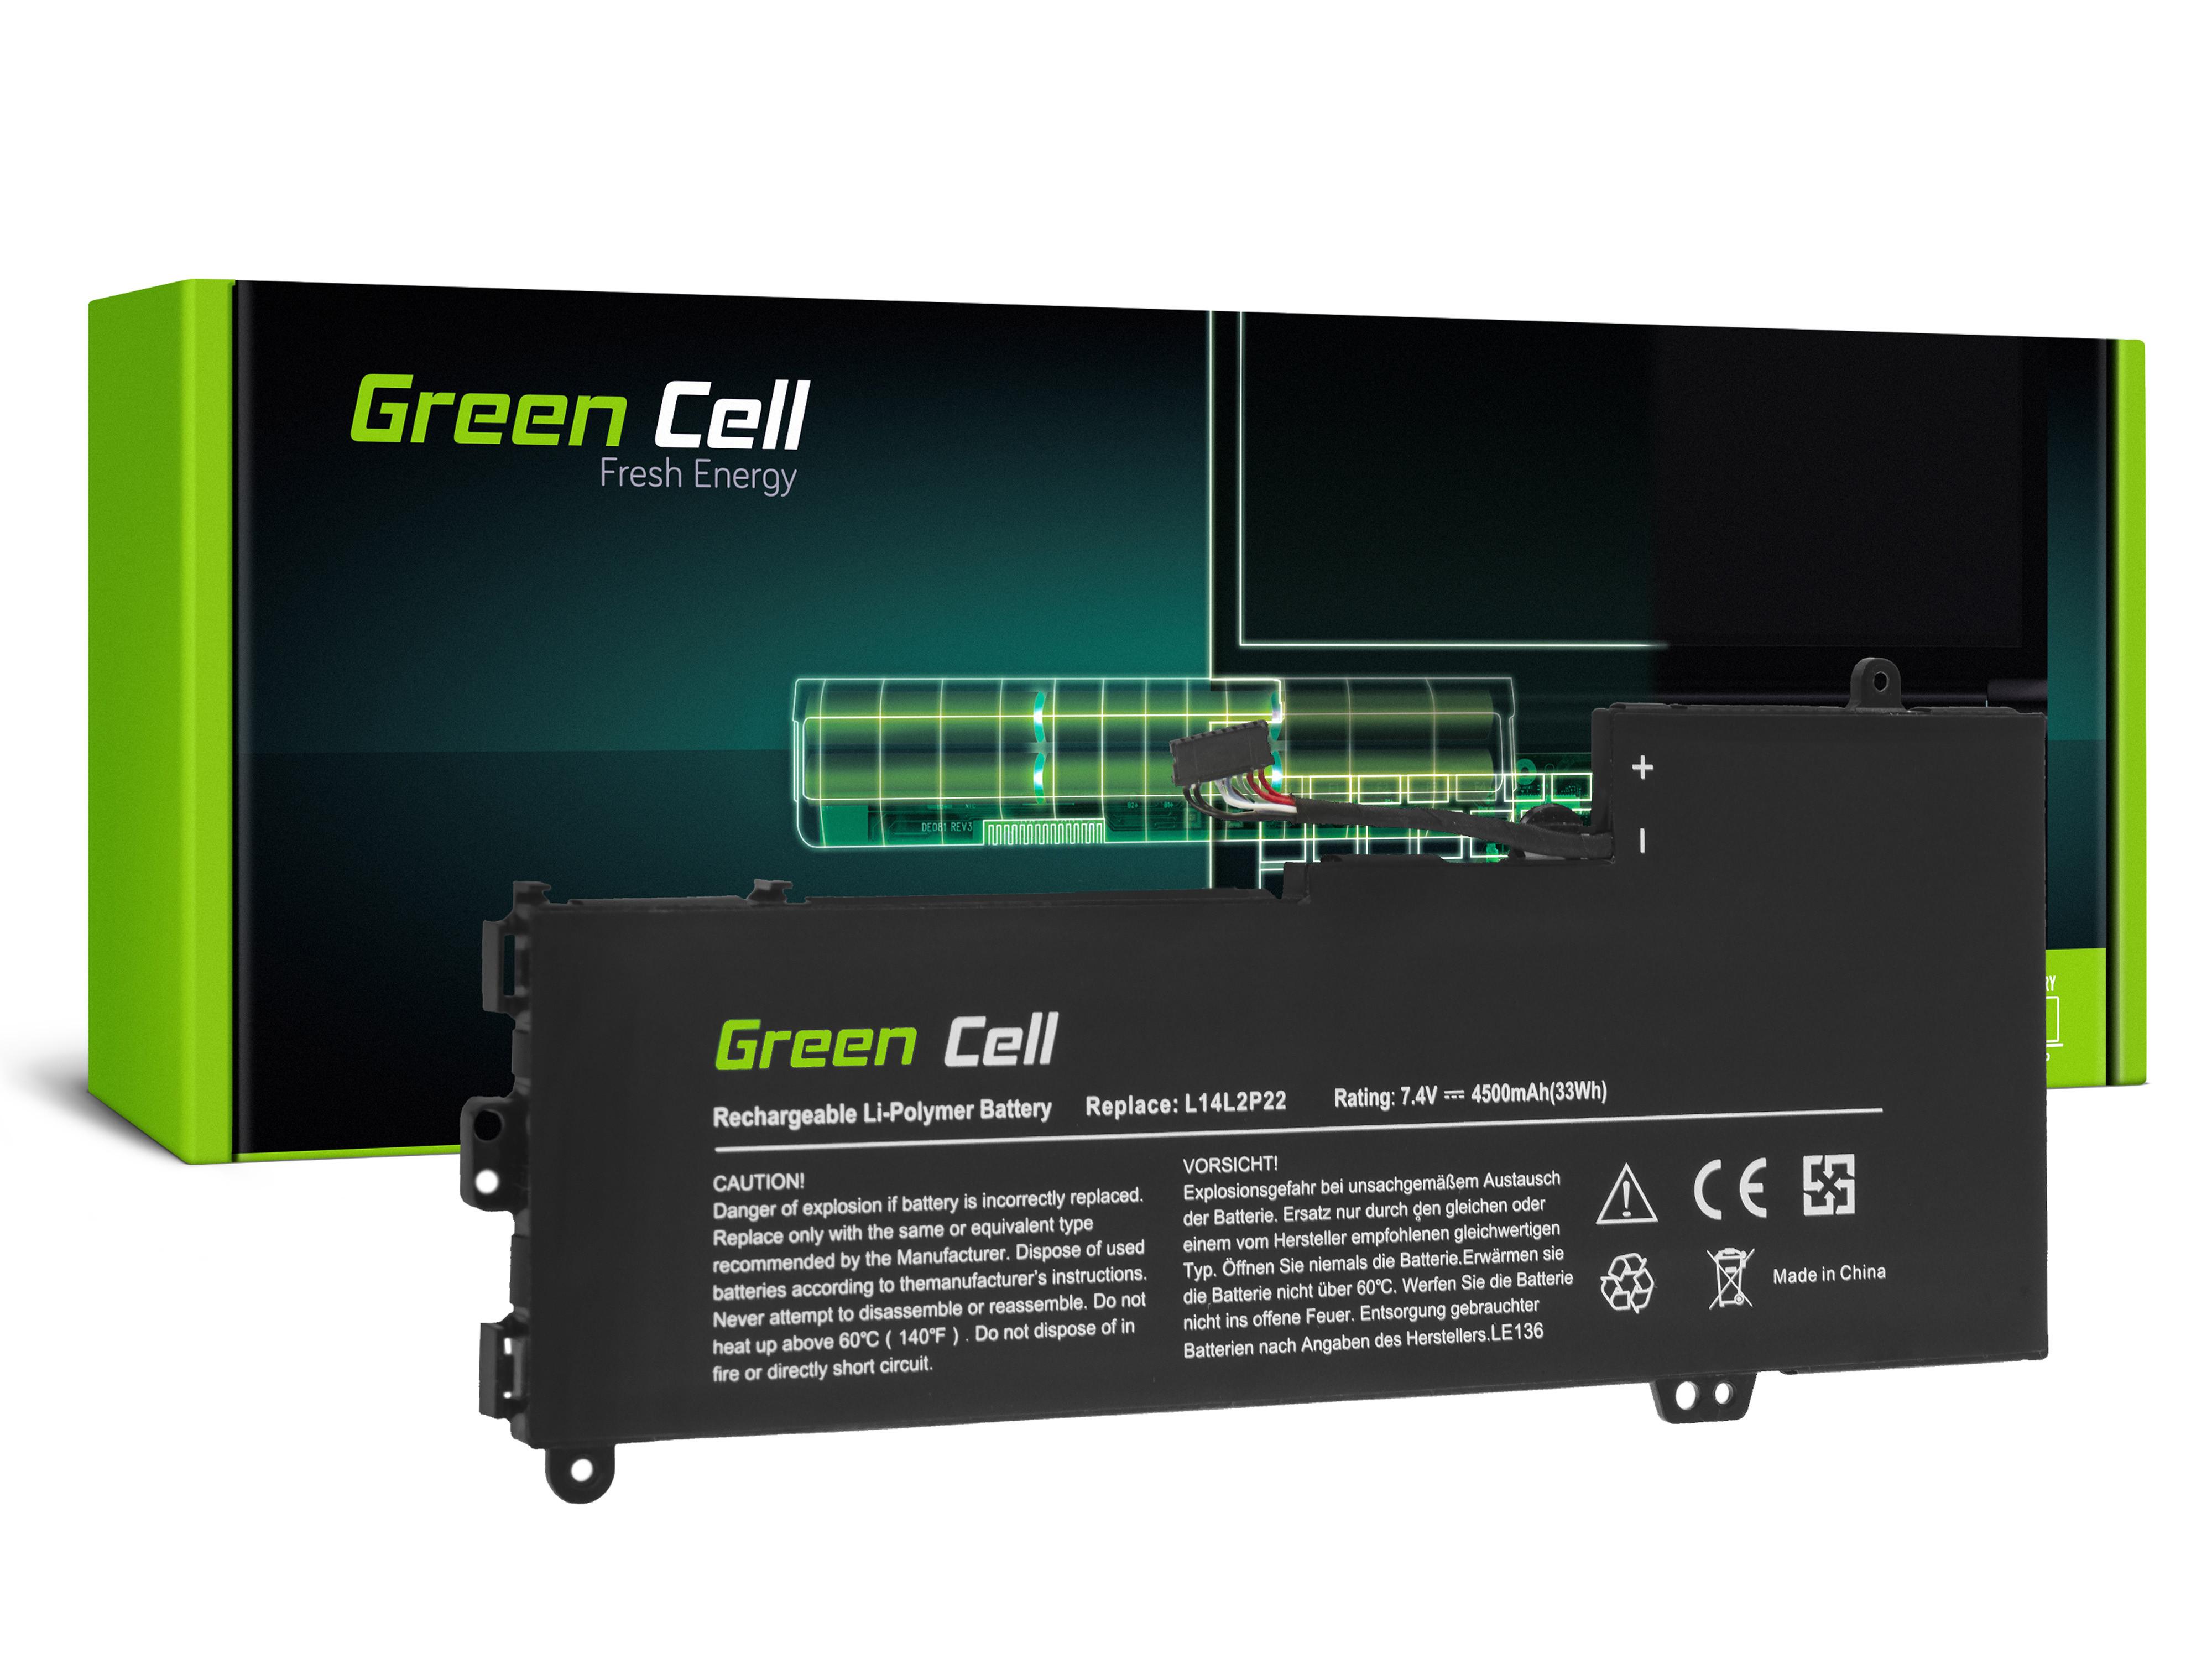 Green Cell LE136 Baterie Lenovo L14L2P22 L14M2P24 L14S2P22 pro Lenovo E31-70 E31-80 U31-70 IdeaPad 500s-13ISK 510s-13IKB 510s-13ISK 4500mAh Li-Pol – neoriginální